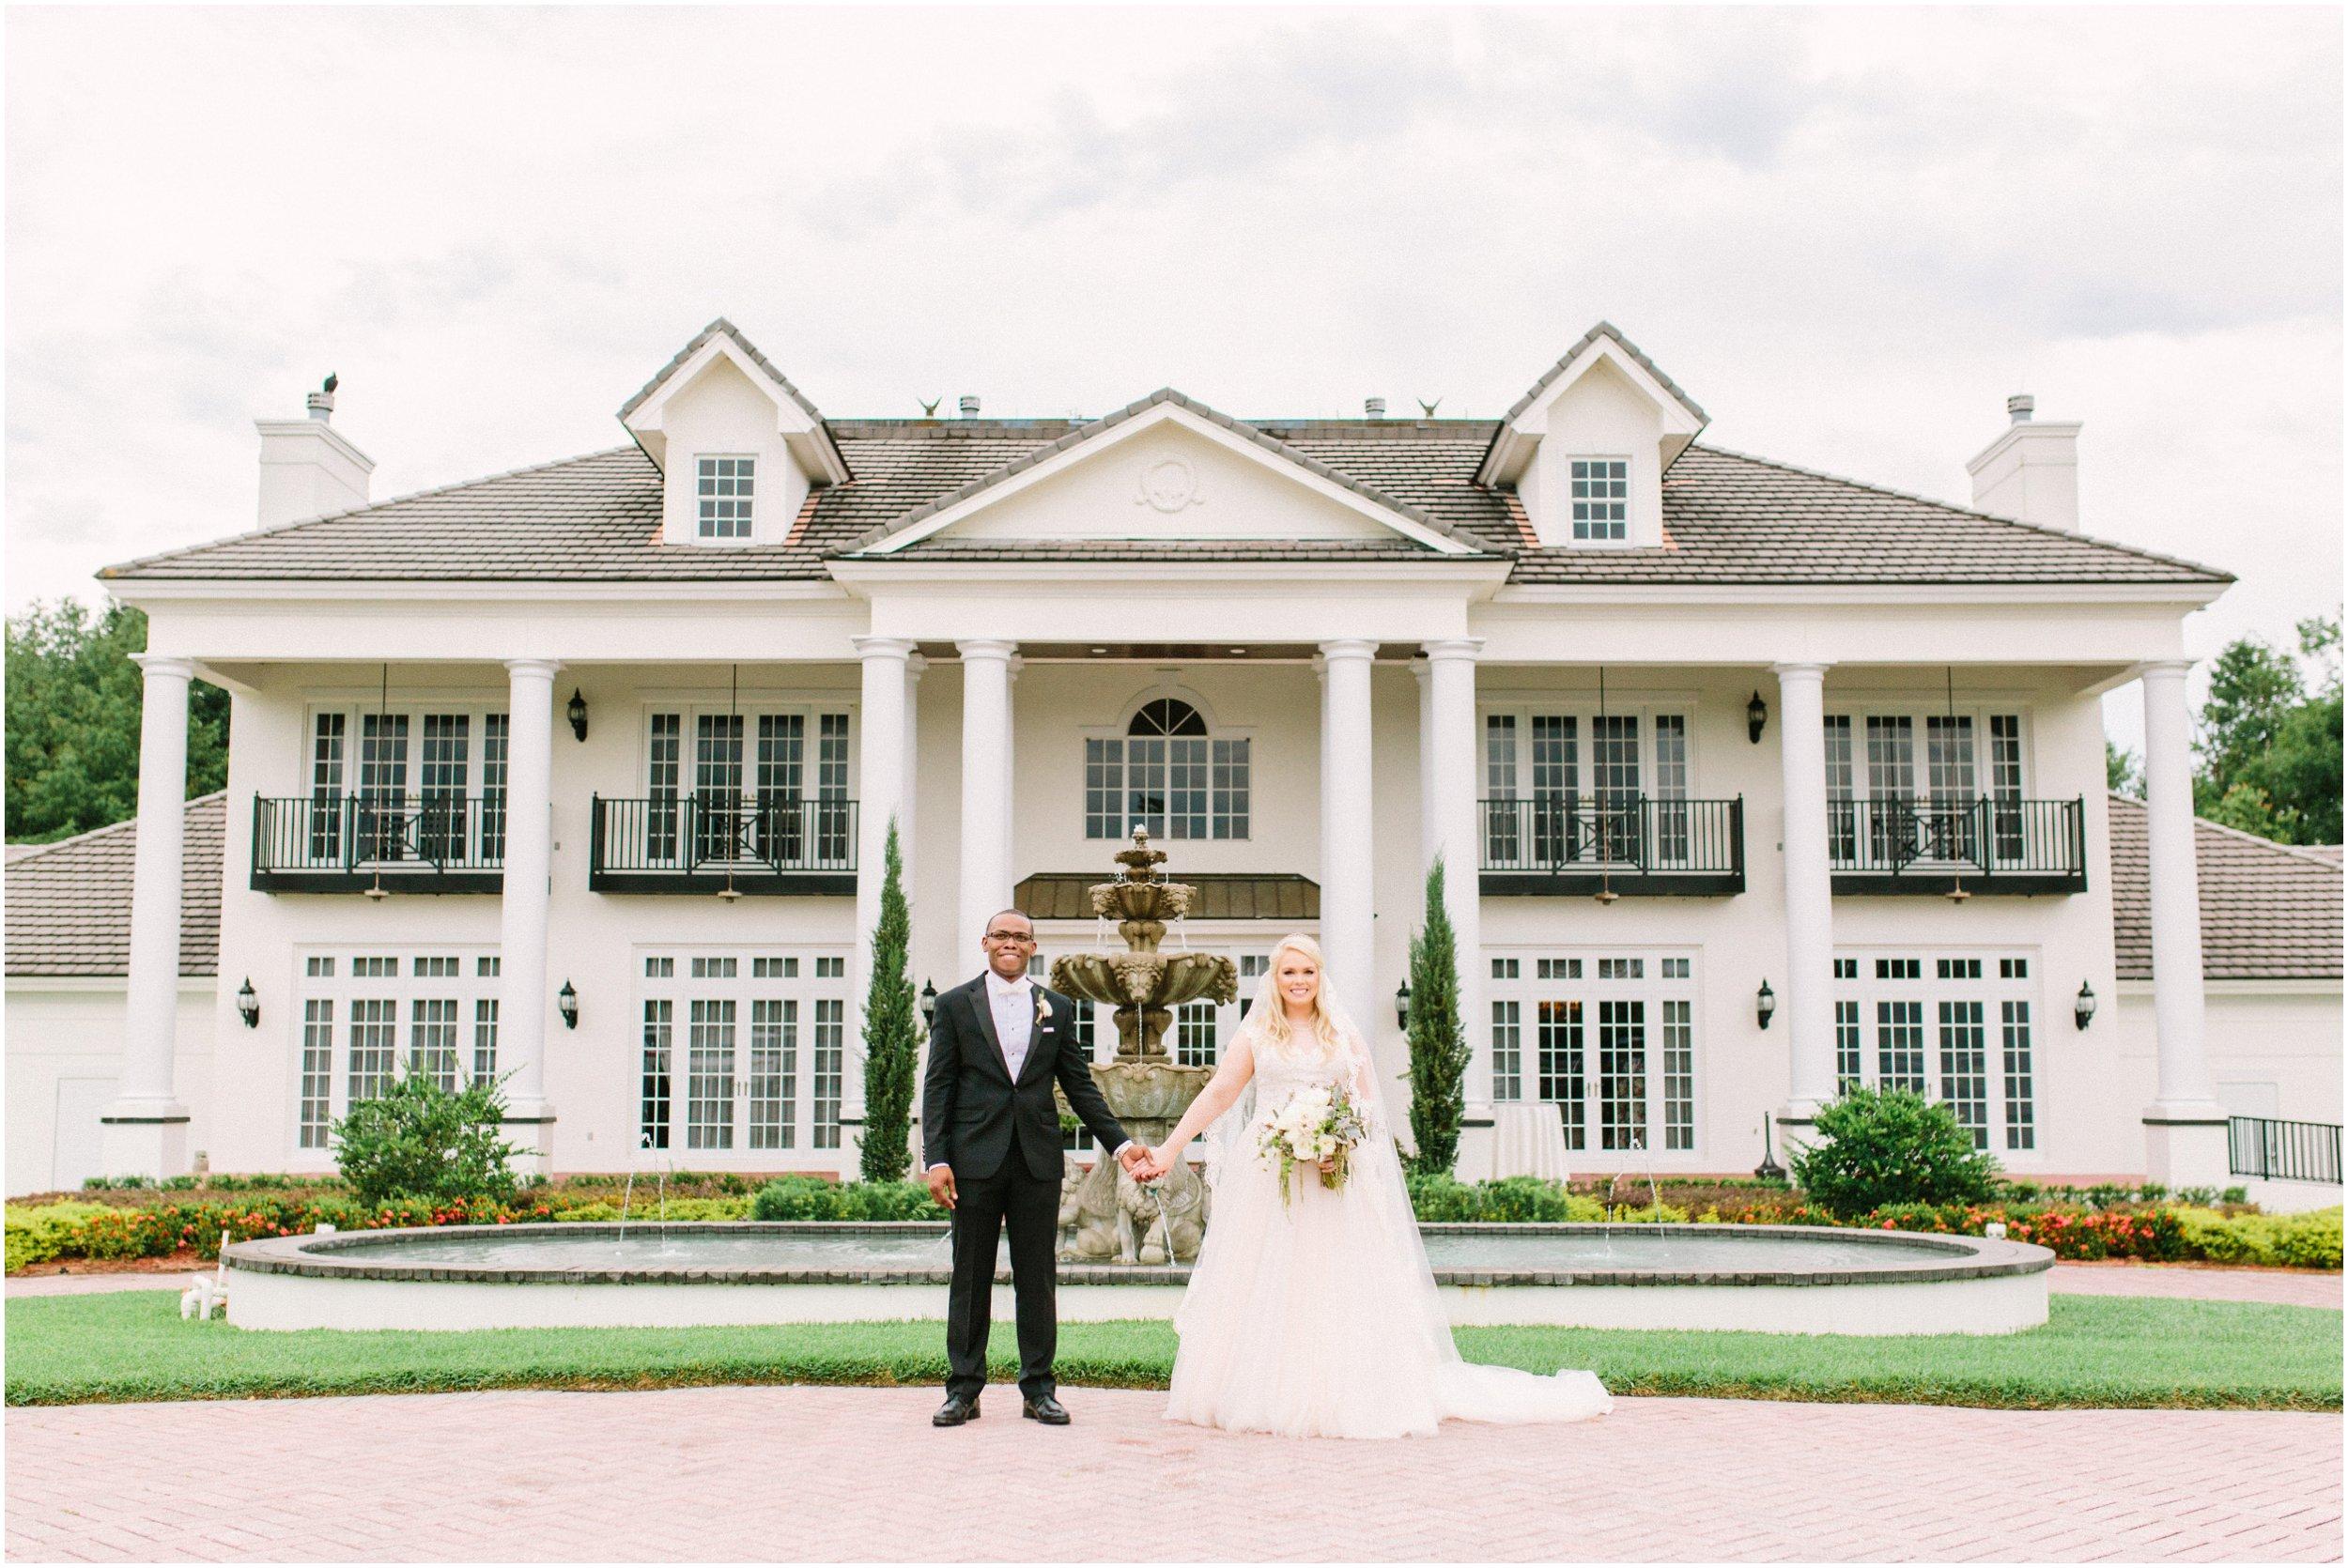 luxmore-grande-estate-orlando-wedding-photographer_0033.jpg